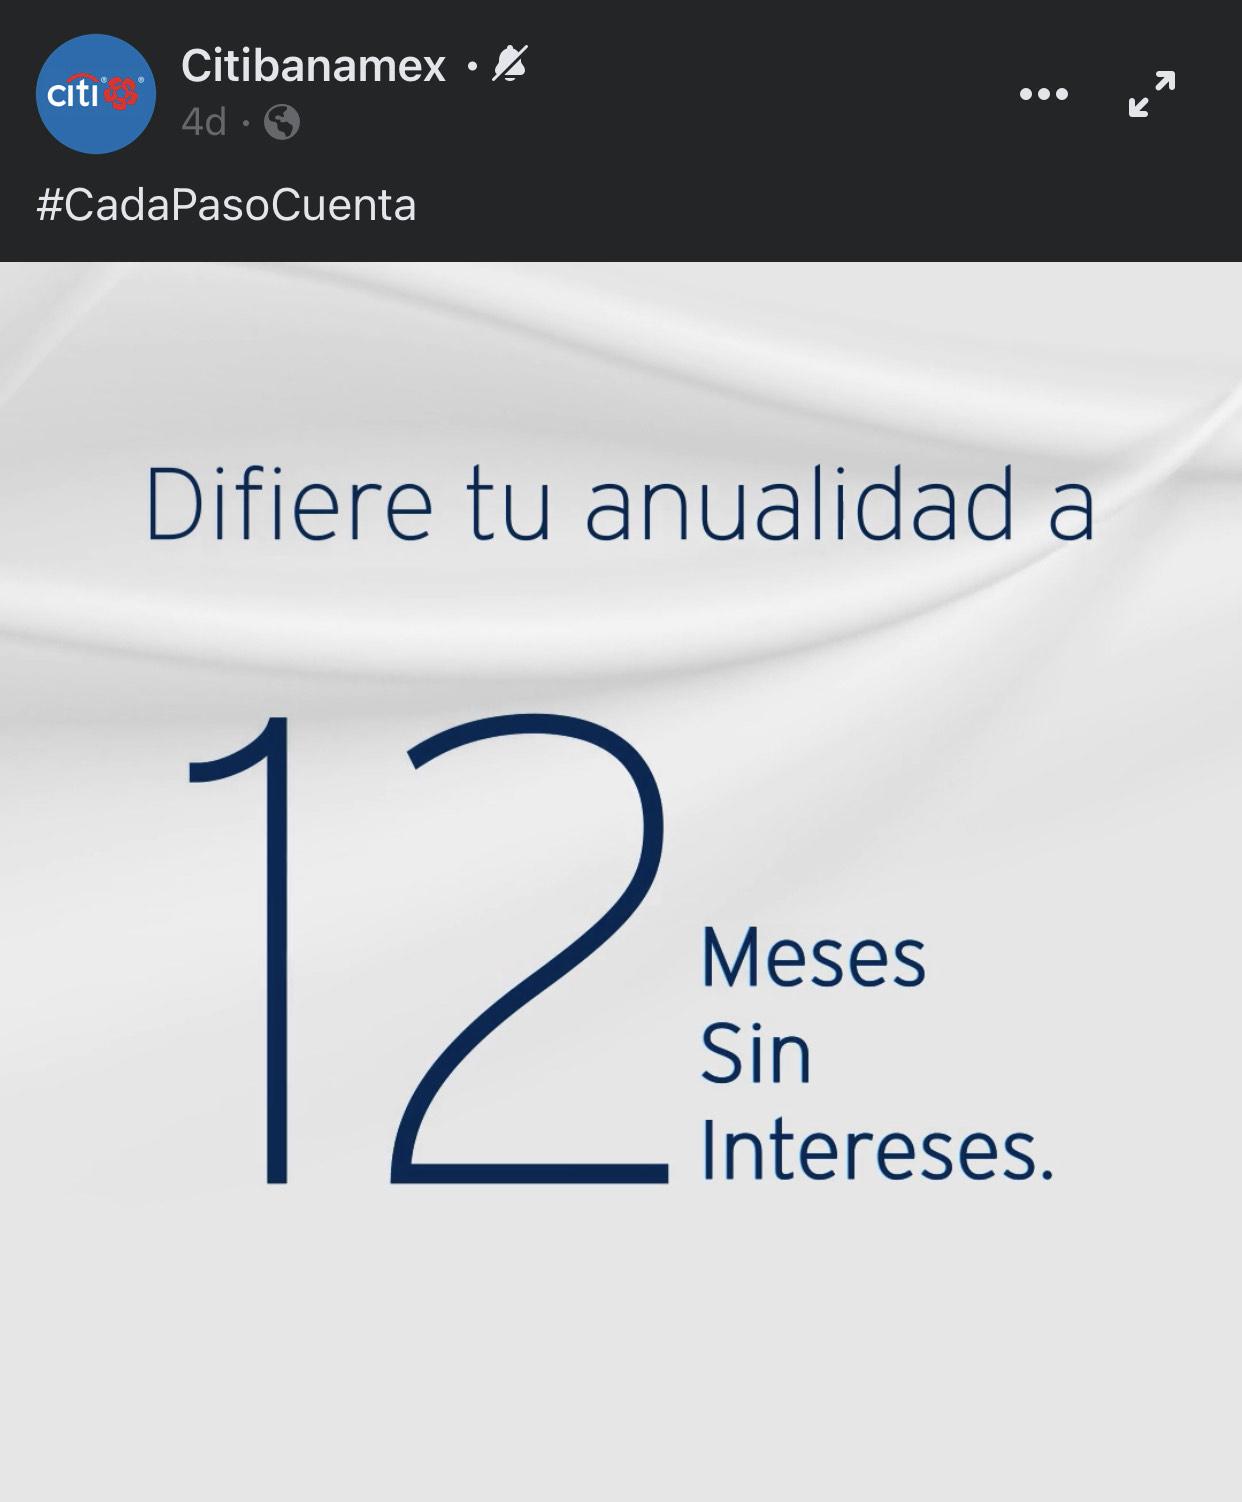 Citibanamex: Anualidad diferida hasta 12 meses sin intereses